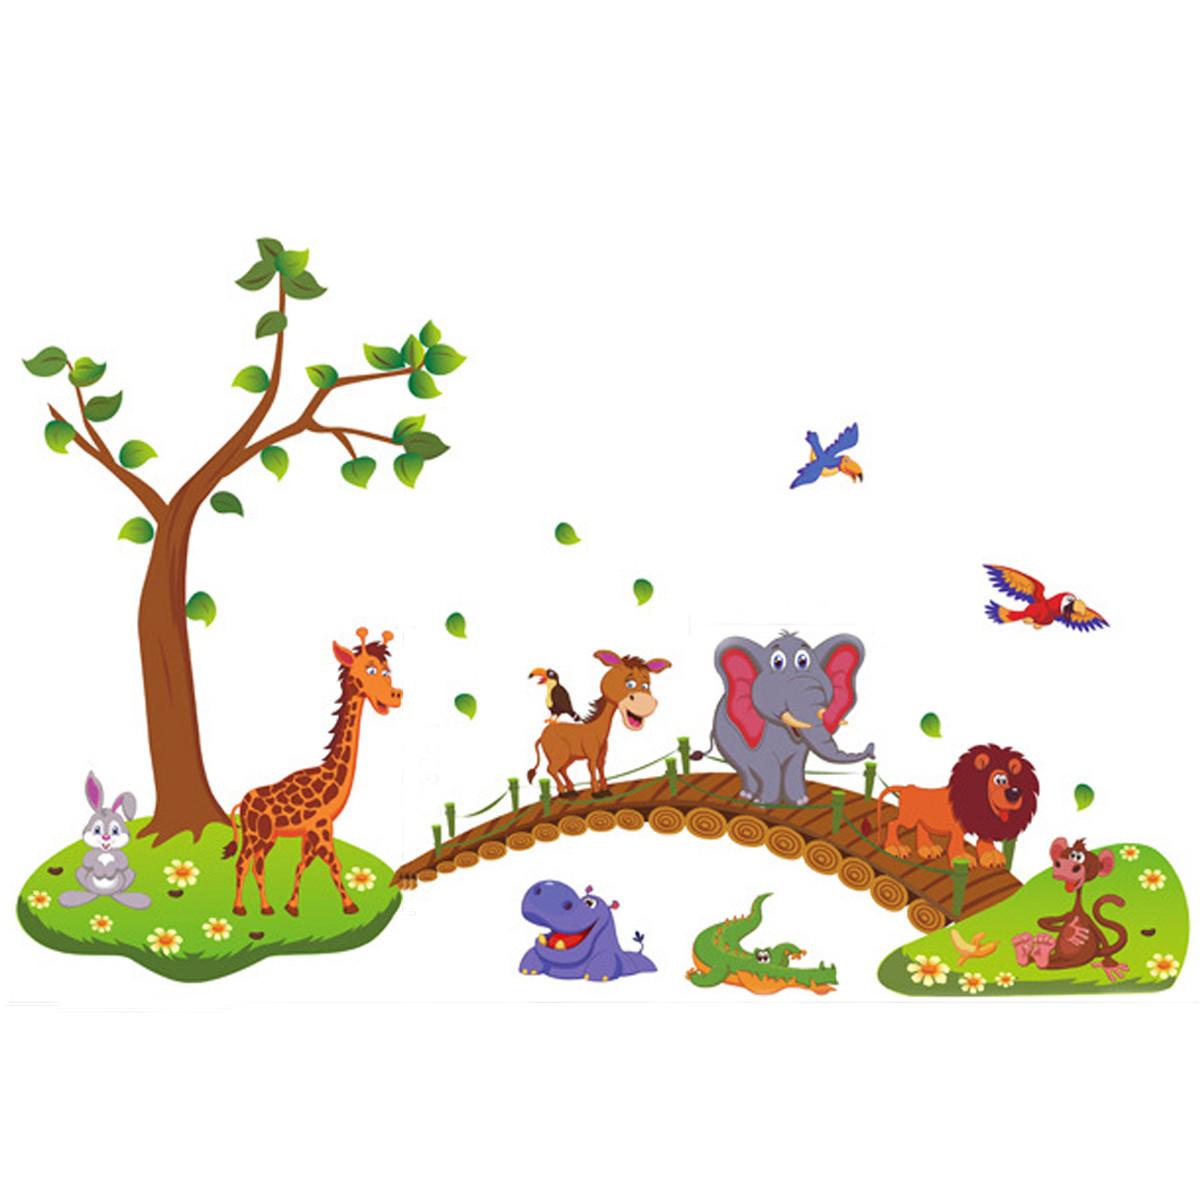 Baby Kids Nursery Cartoon Animal Removable Wallpaper DIY Sticker Tree Decal Art Cute Home Decoration